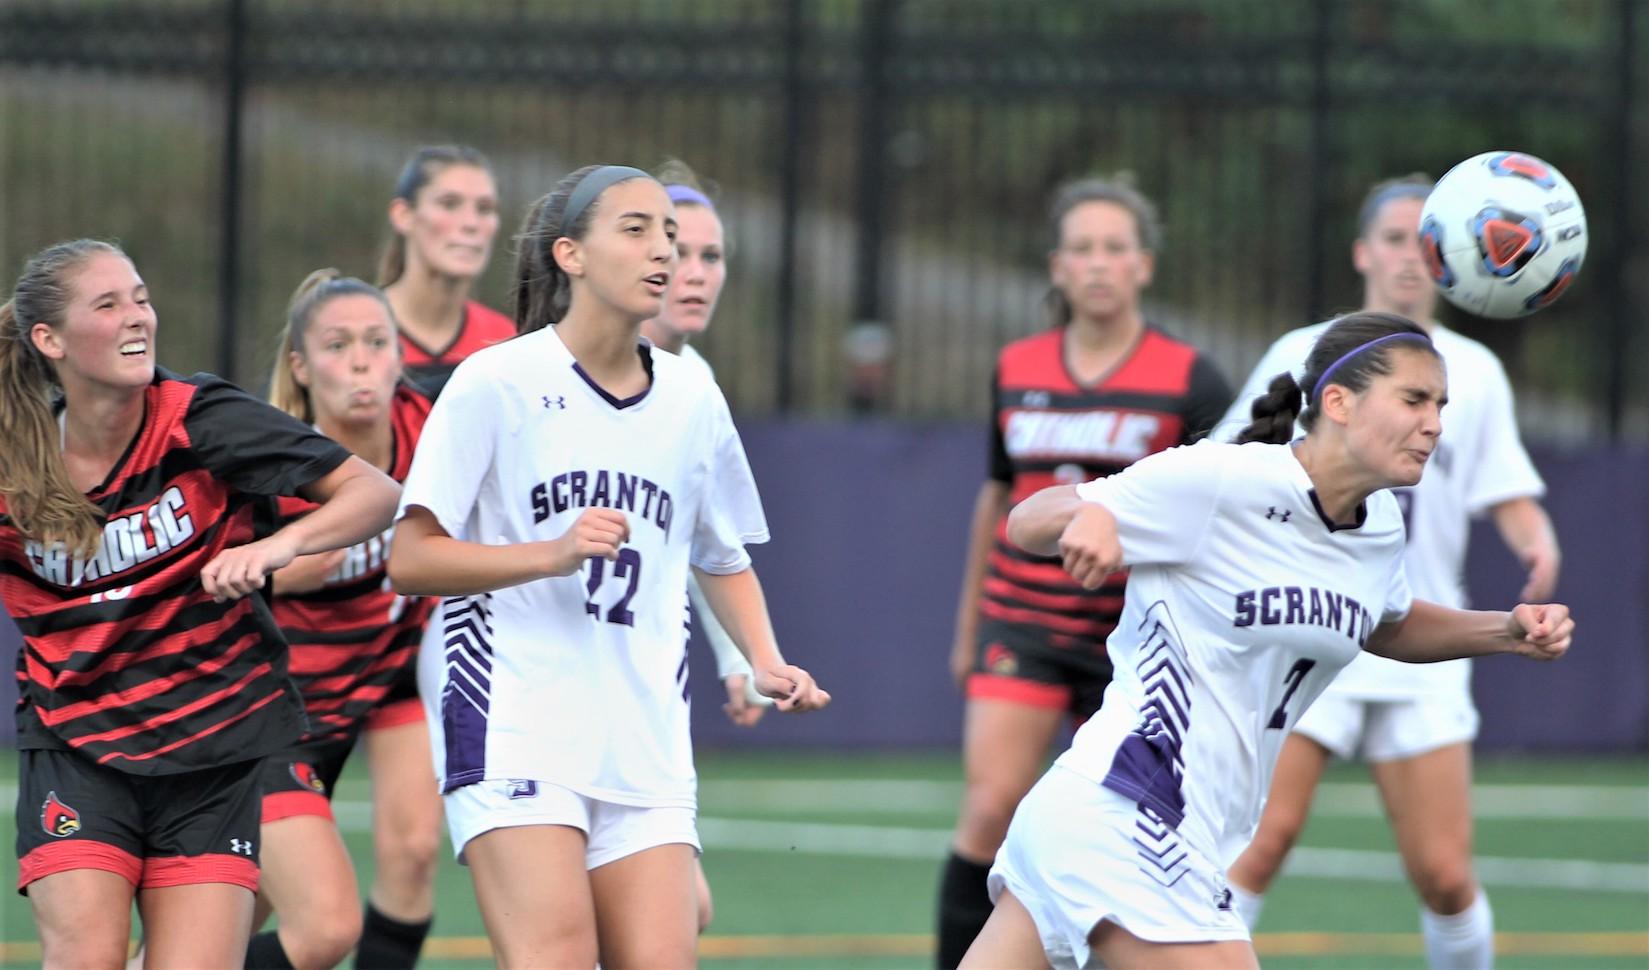 http://athletics.scranton.edu/sports/wsoc/2019-20/photos/Action_Shots_2019/Catholic/Jessica_Letherbarrow_4.JPG